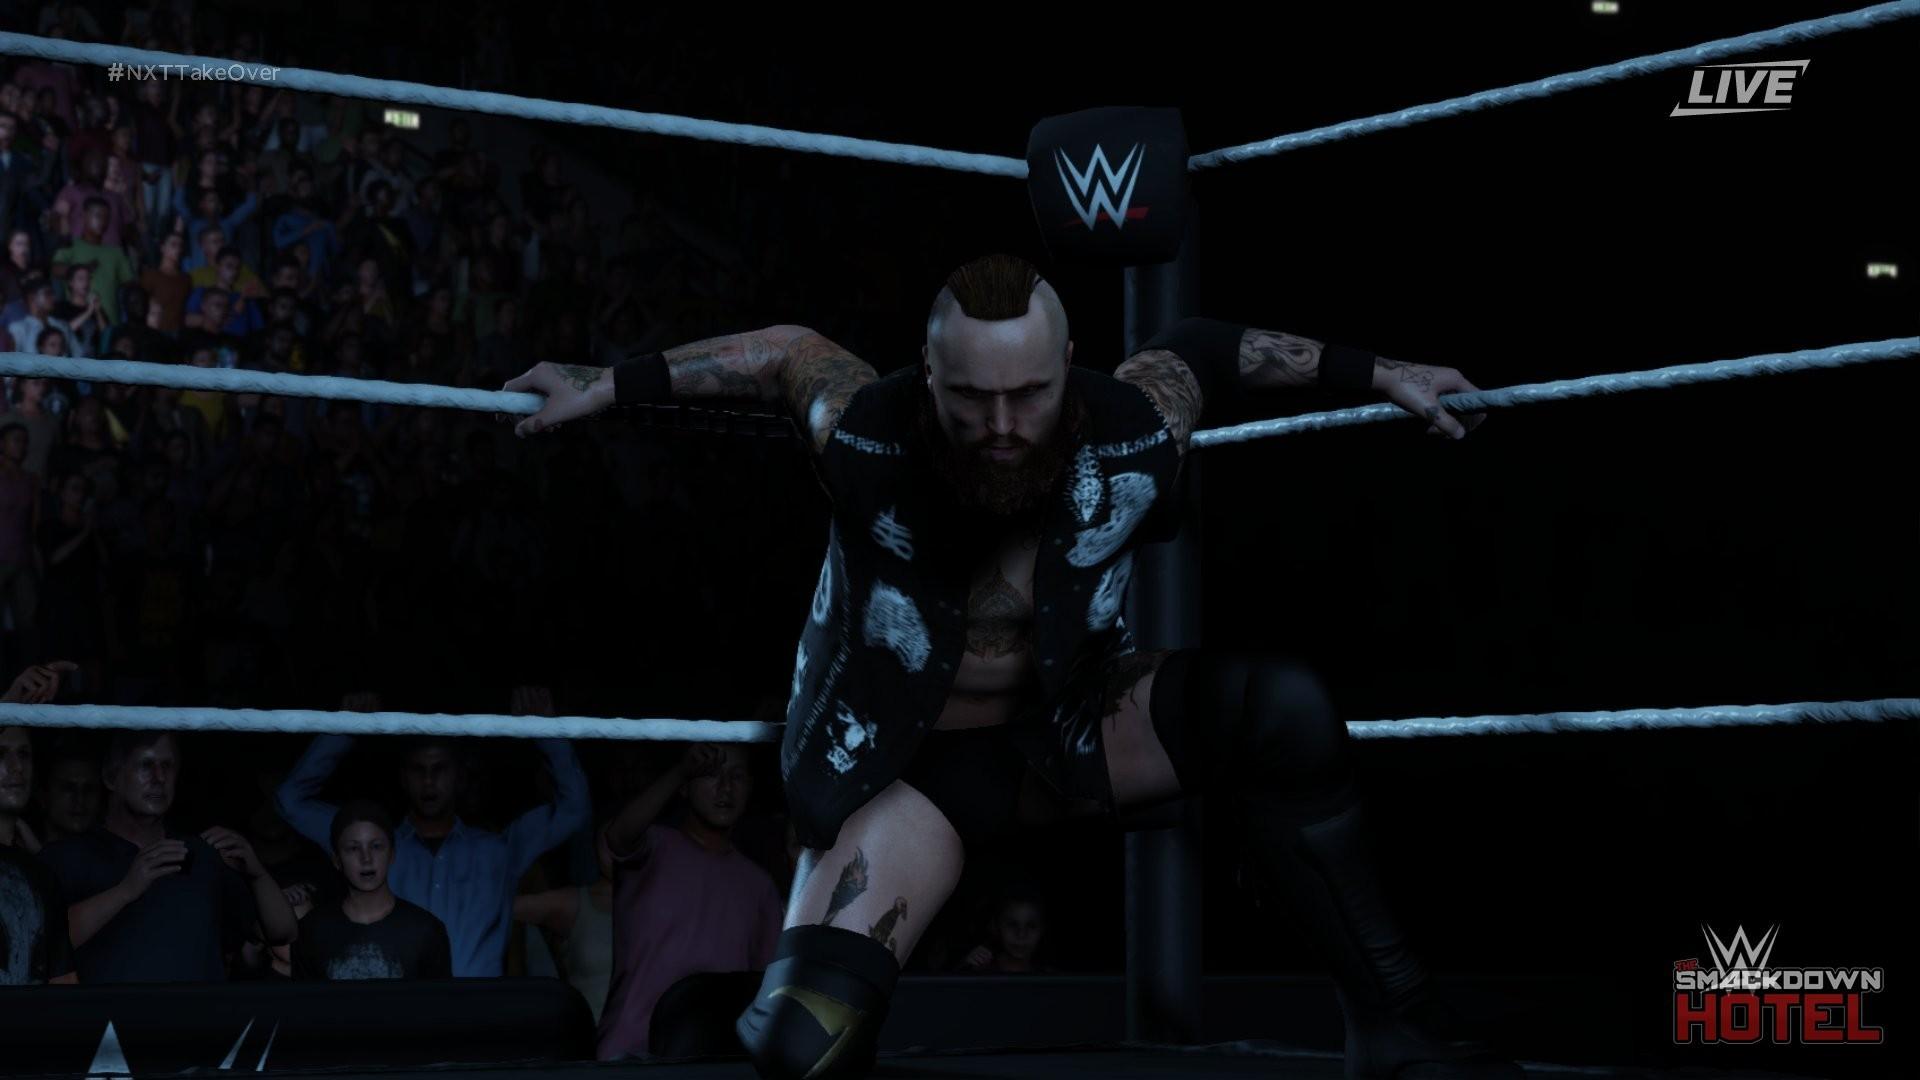 Res: 1920x1080, WWE2K18 NXT DLC AleisterBlack WWE2K18 NXT DLC AleisterBlack 2 WWE2K18 NXT  DLC AleisterBlack 3 ...